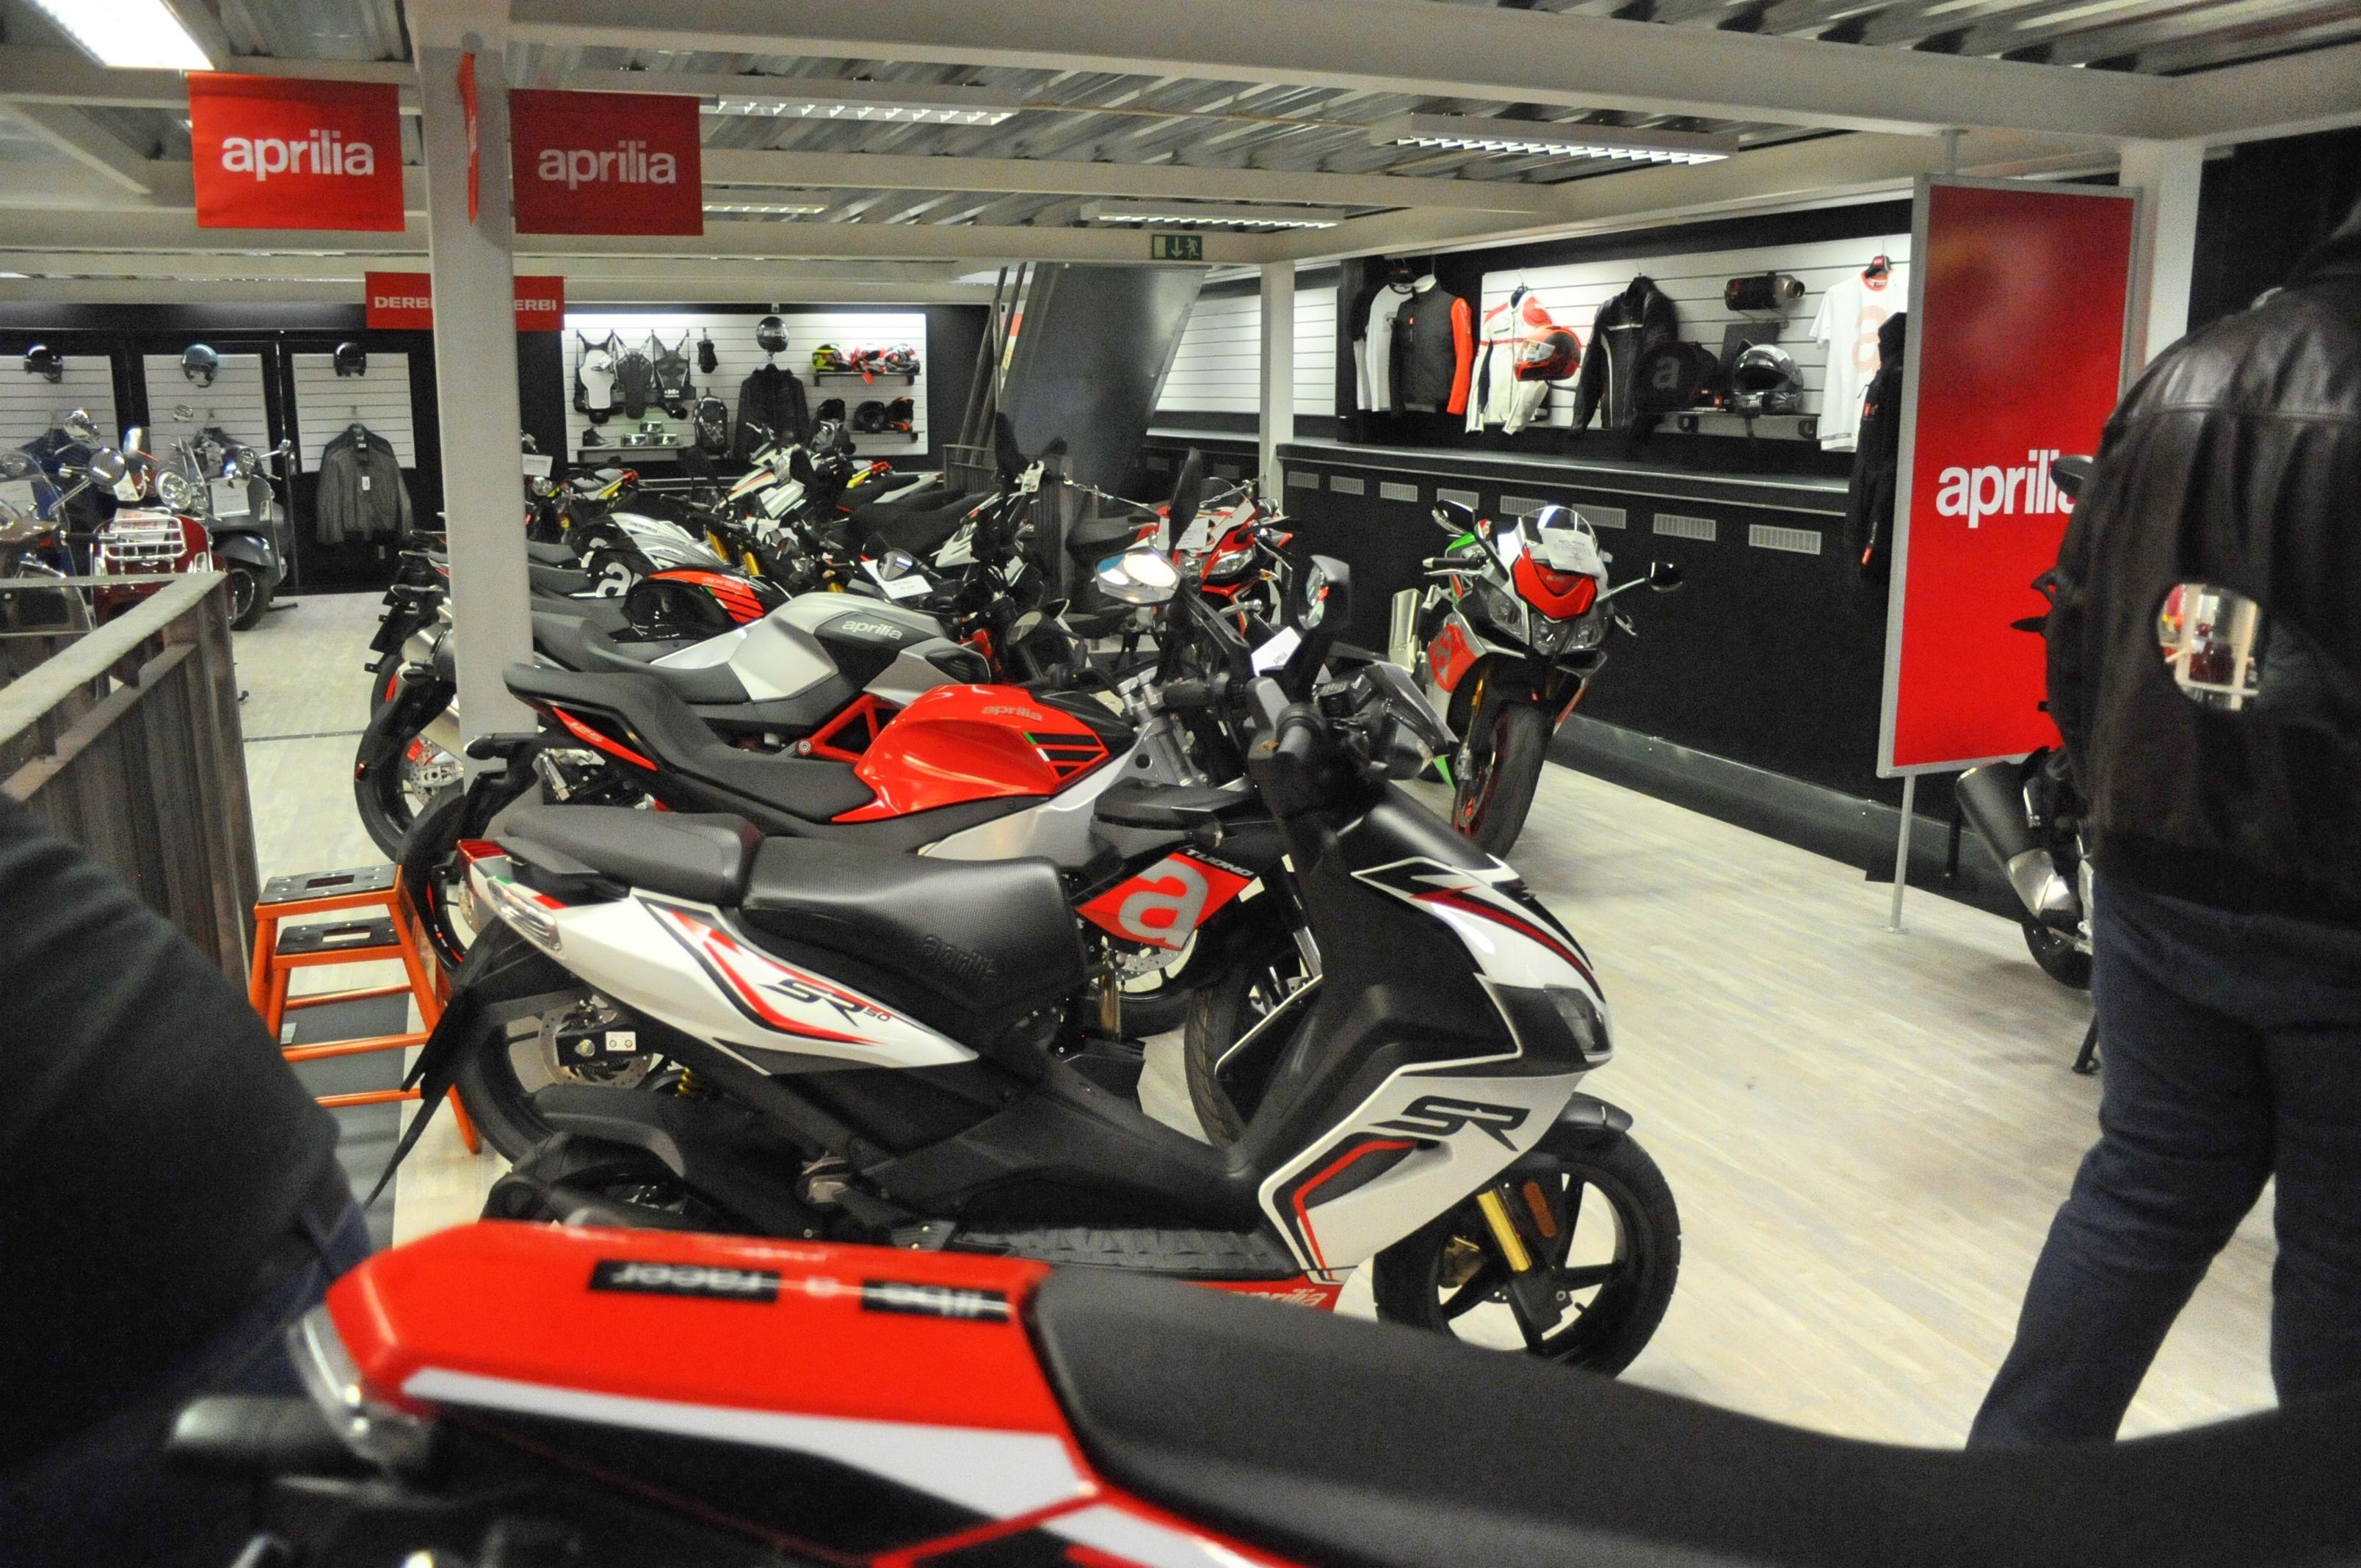 ProBike - Sveriges största moped & mc butik